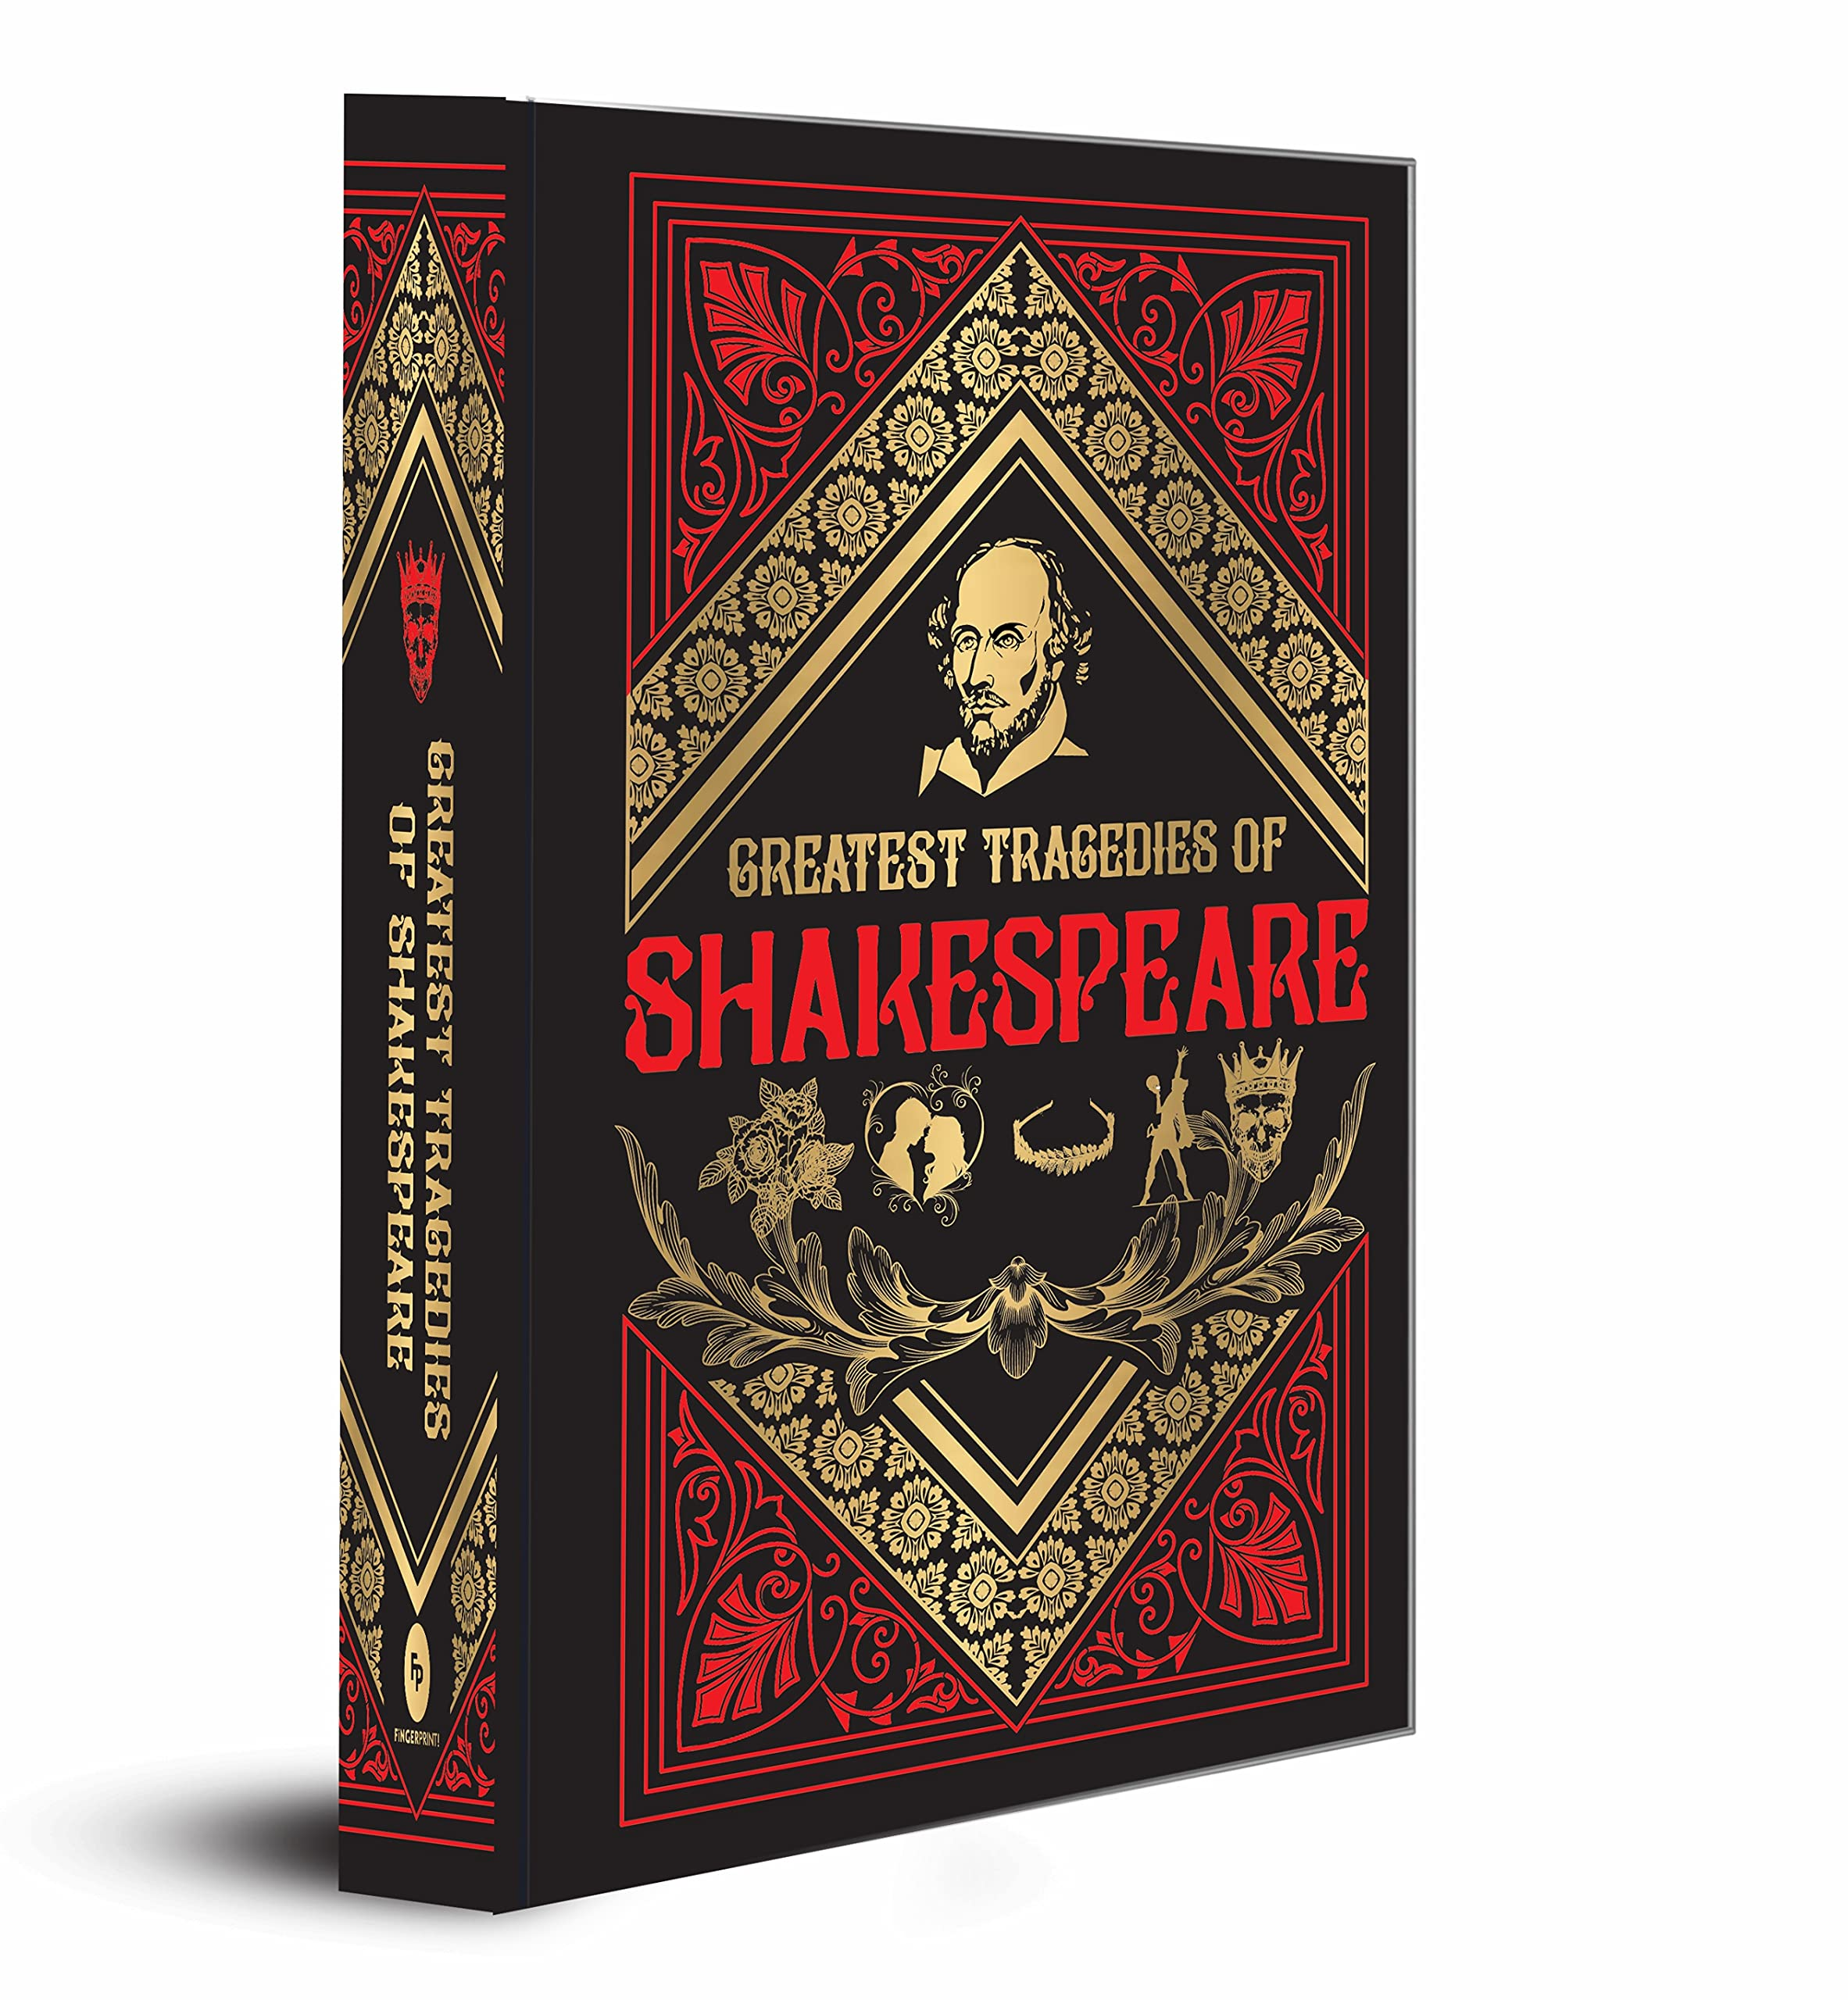 Greatest Tragedies of Shakespeare (Deluxe Hardbound Edition)